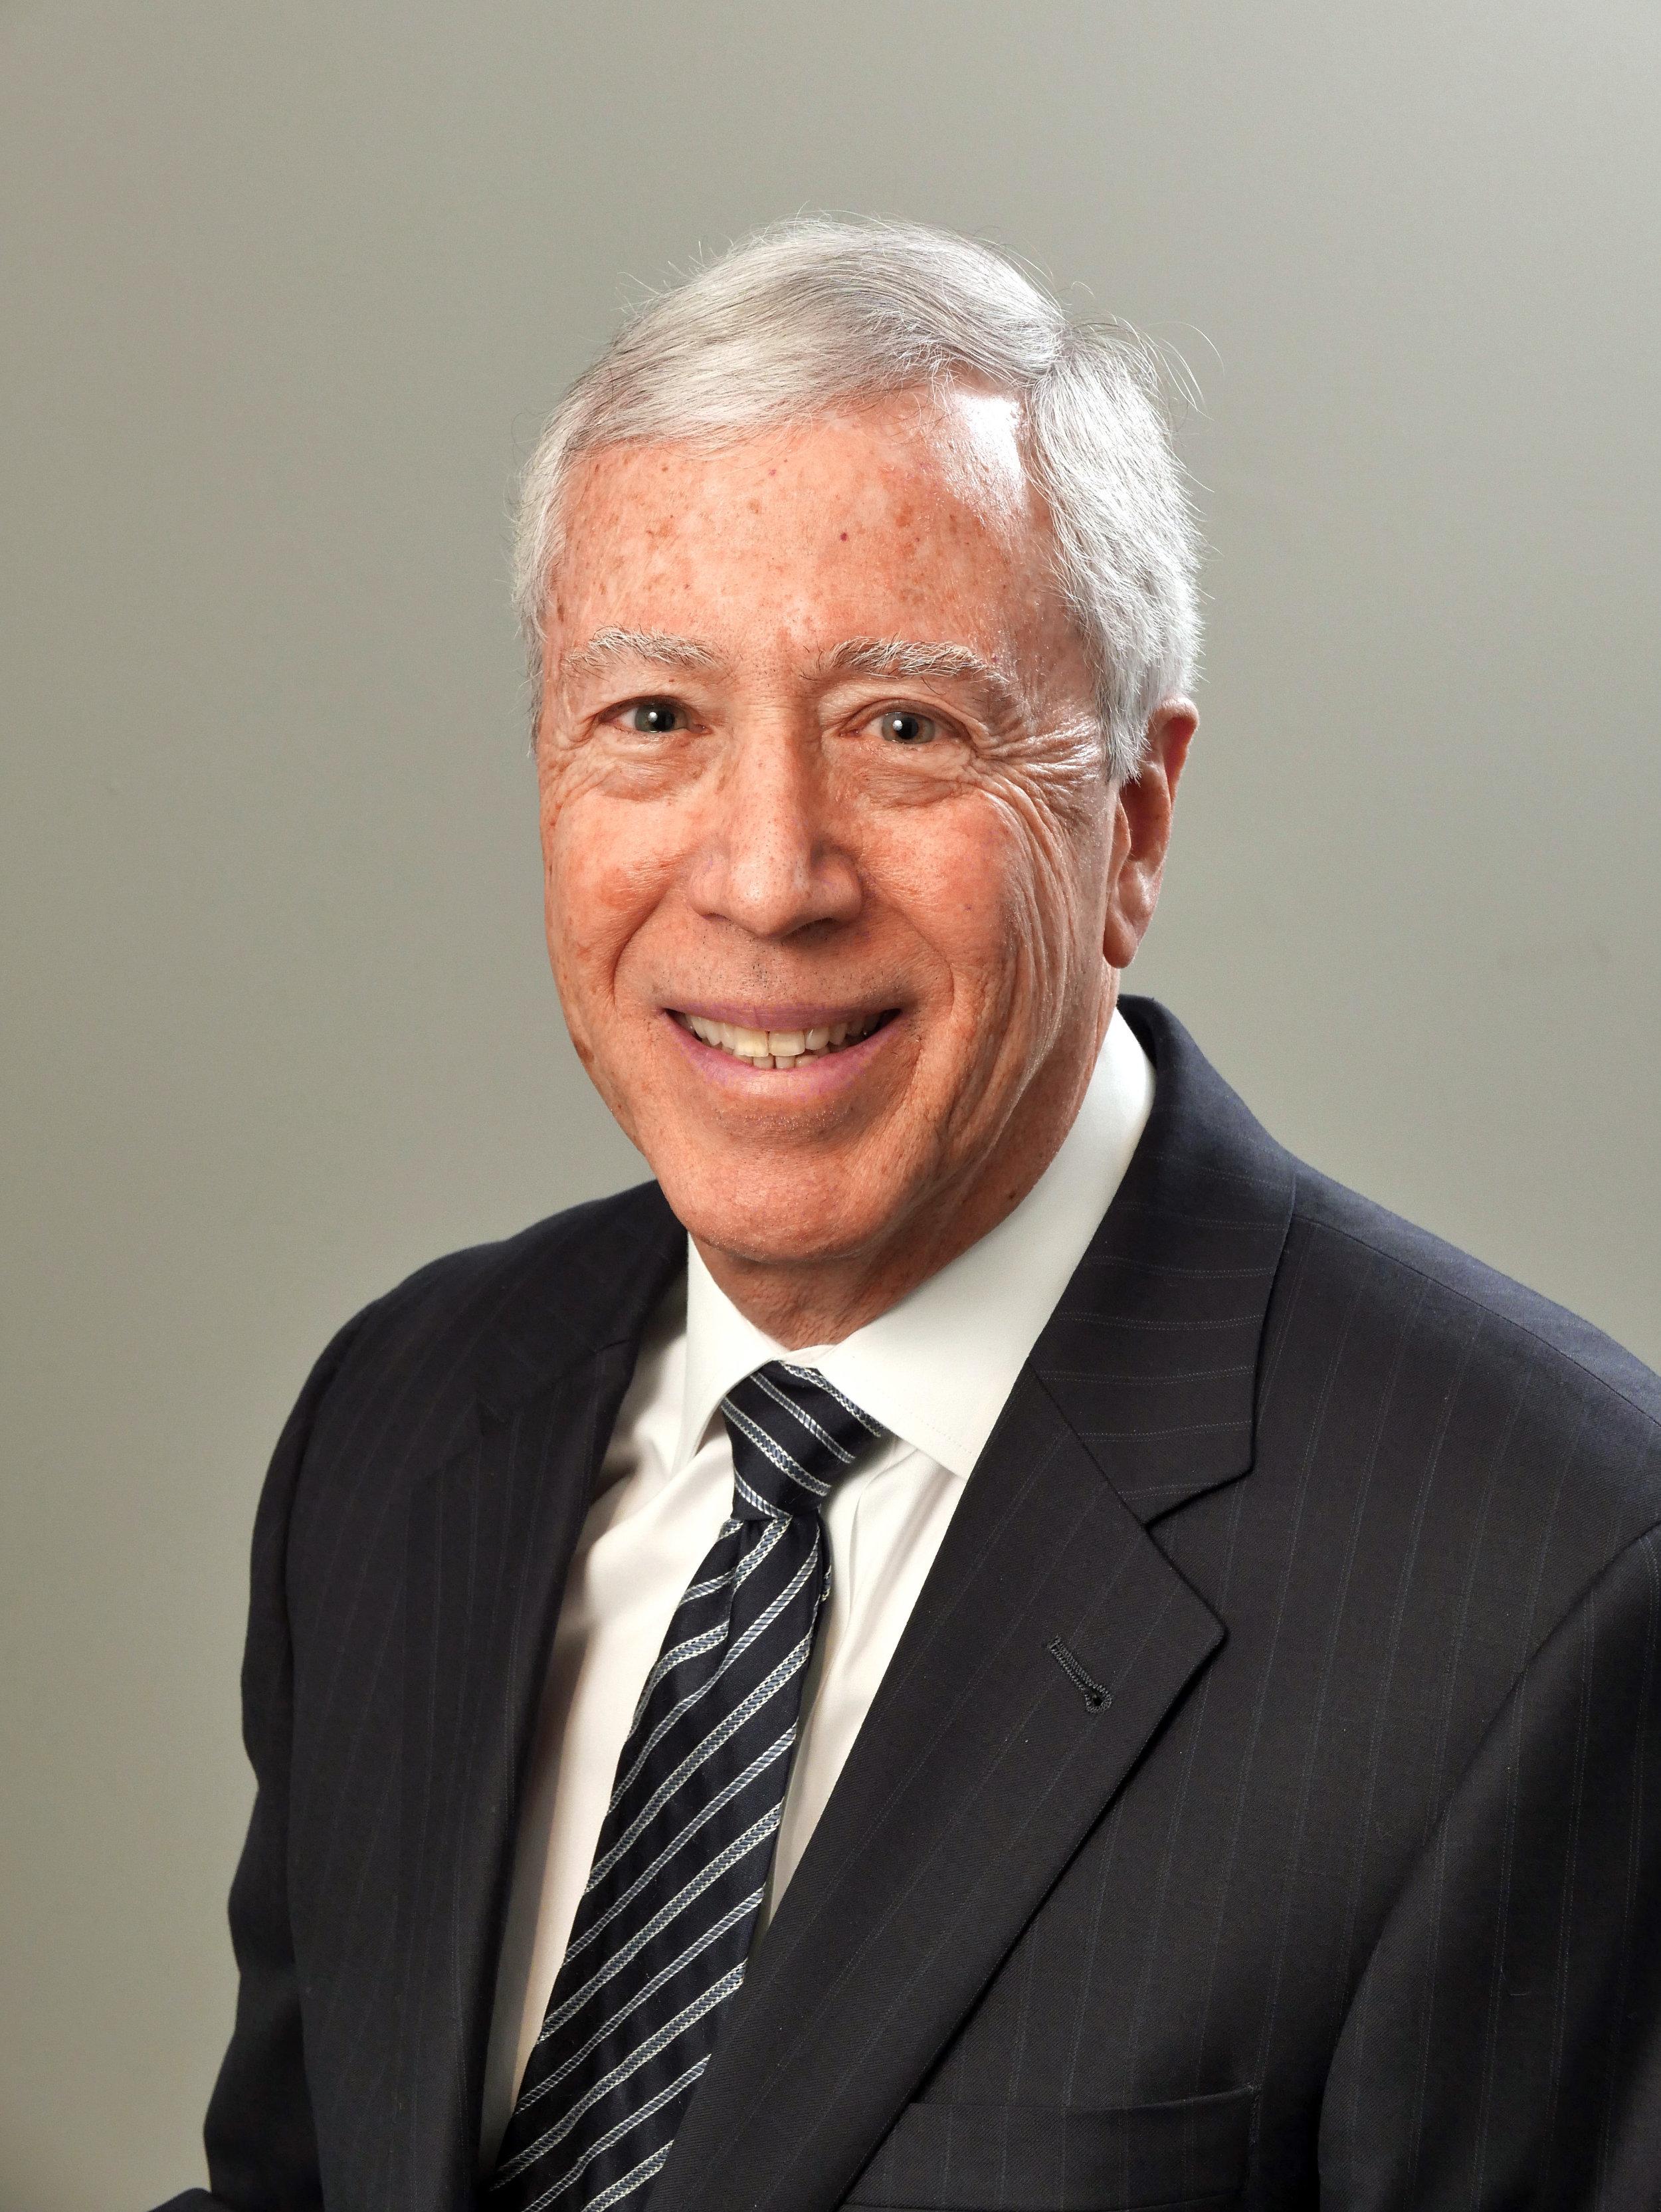 Michael Peterman, CEO